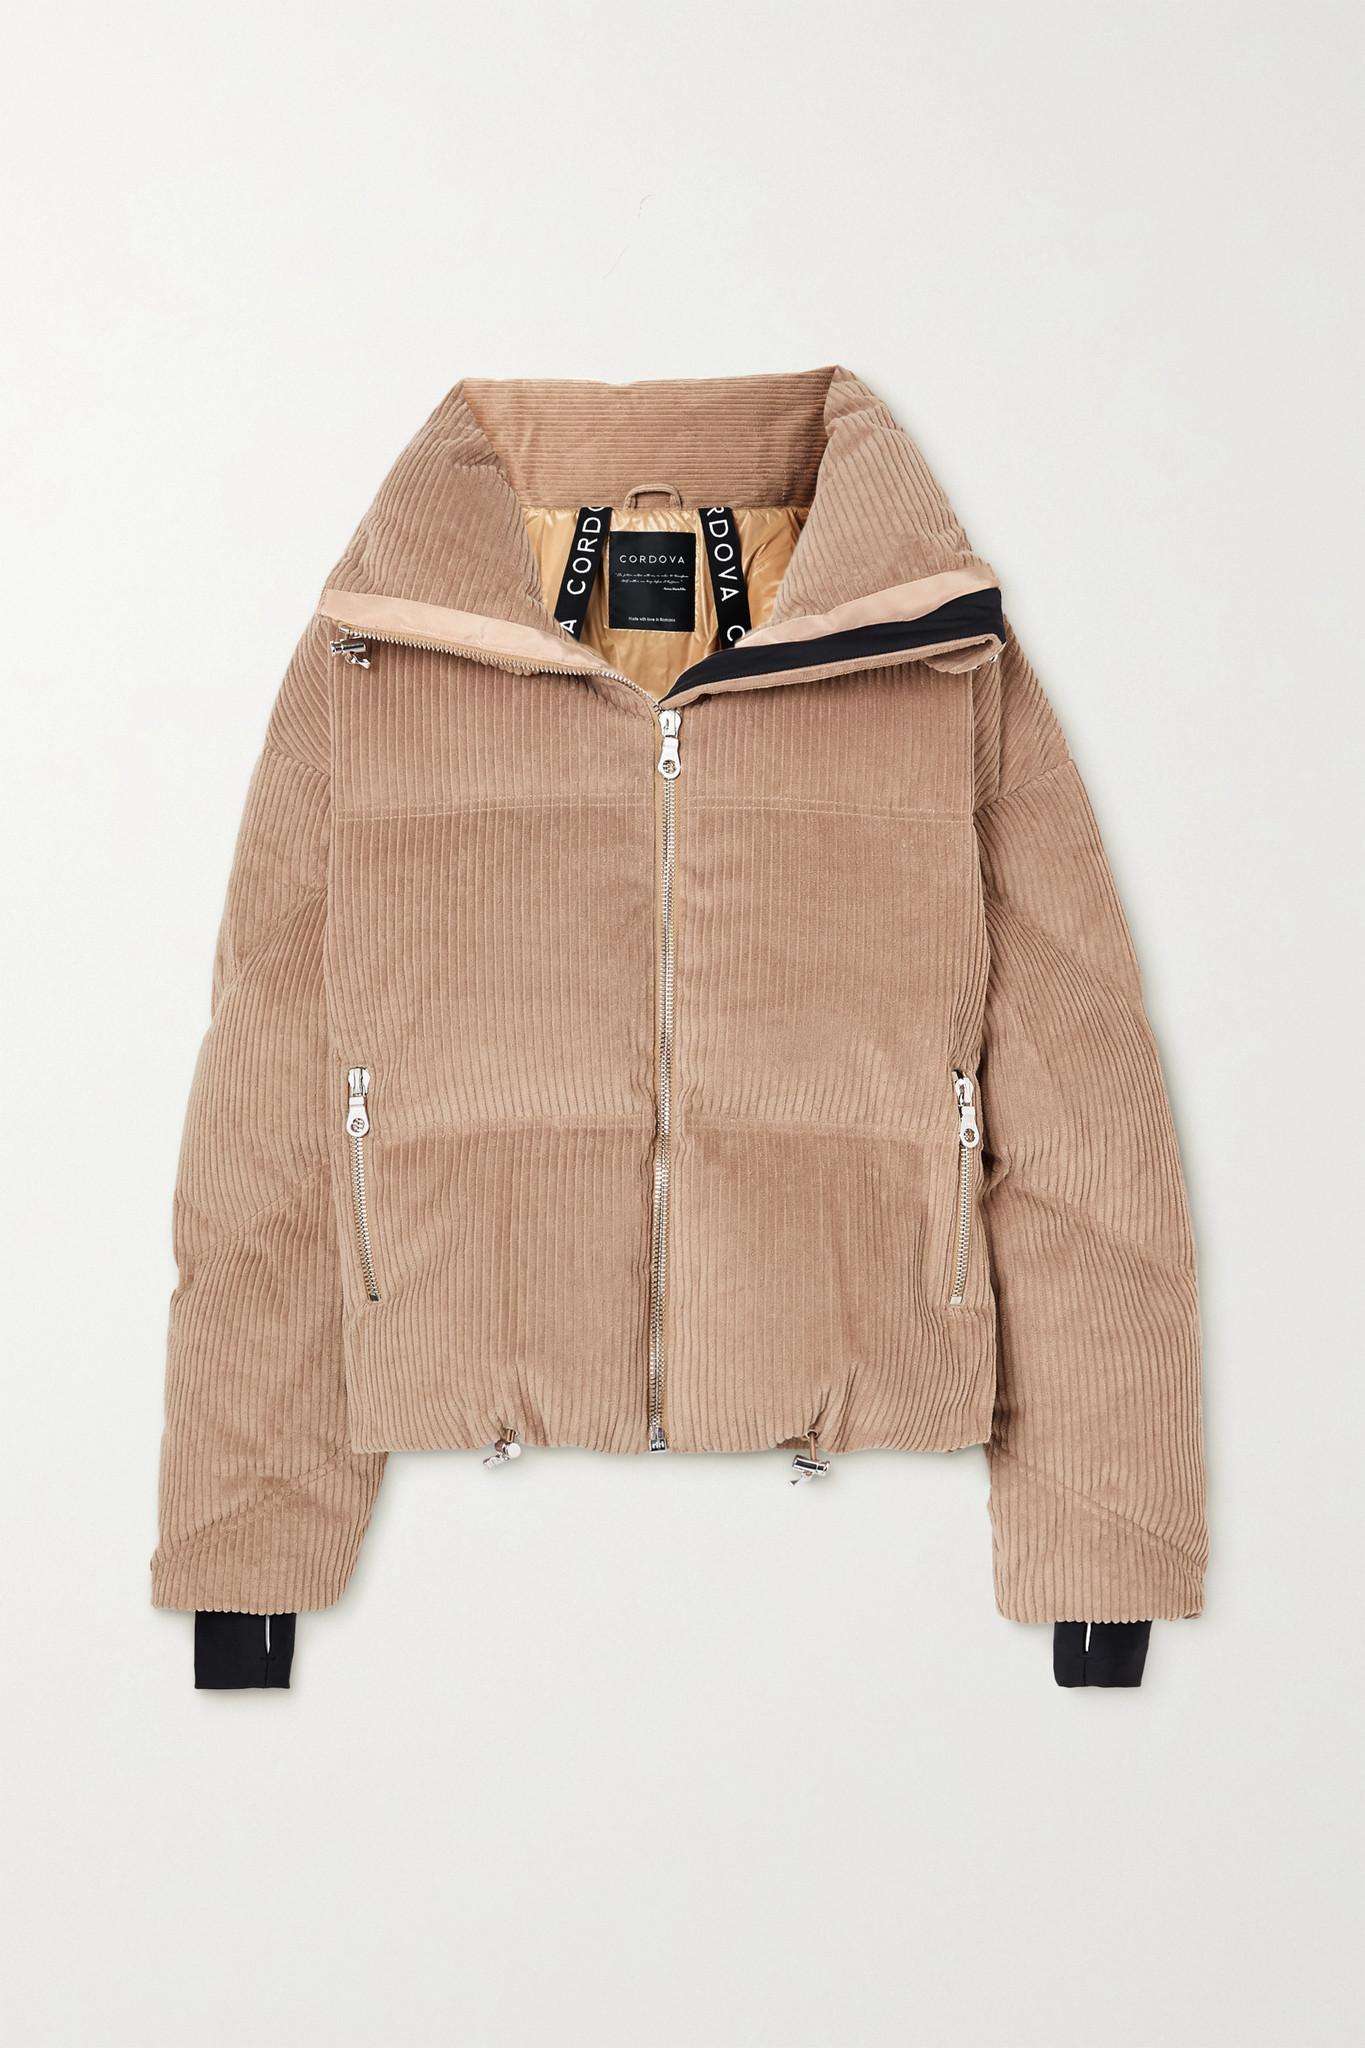 CORDOVA - Mont Blanc 绗缝灯芯绒连帽羽绒夹克 - 棕色 - medium